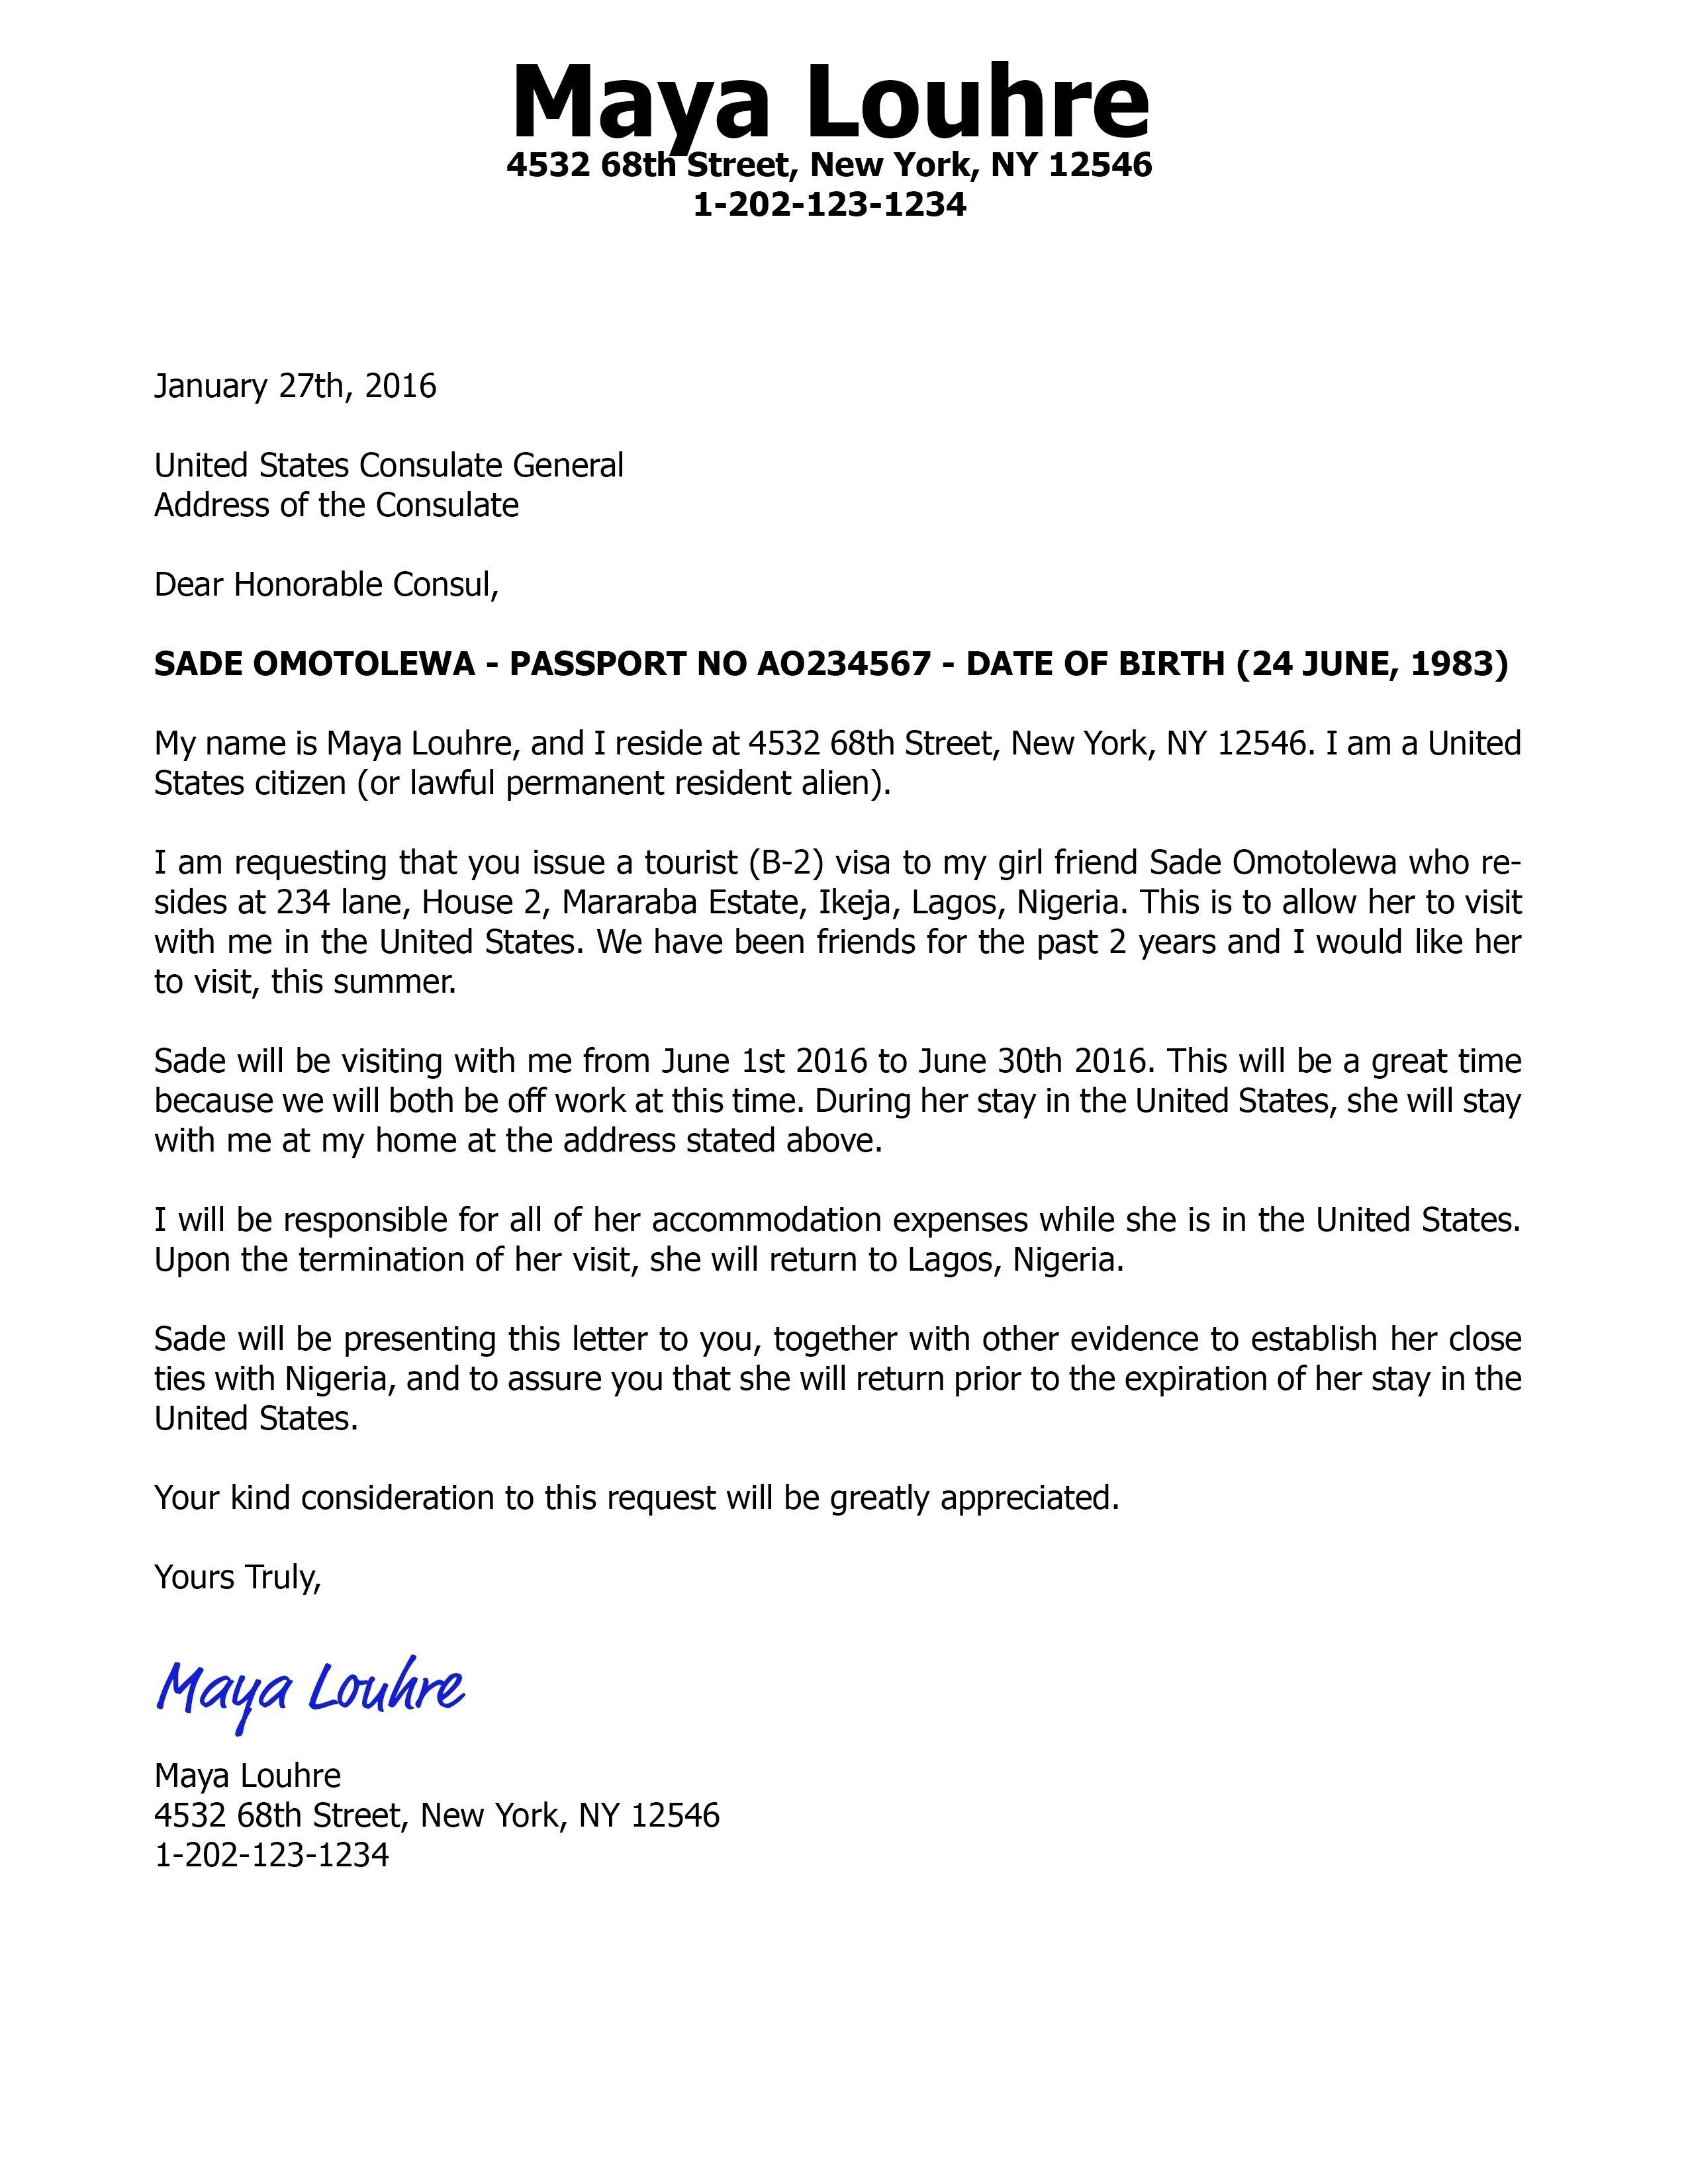 Template for Invitation Letter for Us Visa - Sample Invitation Letter Chinese Business Visa Fresh Invitation